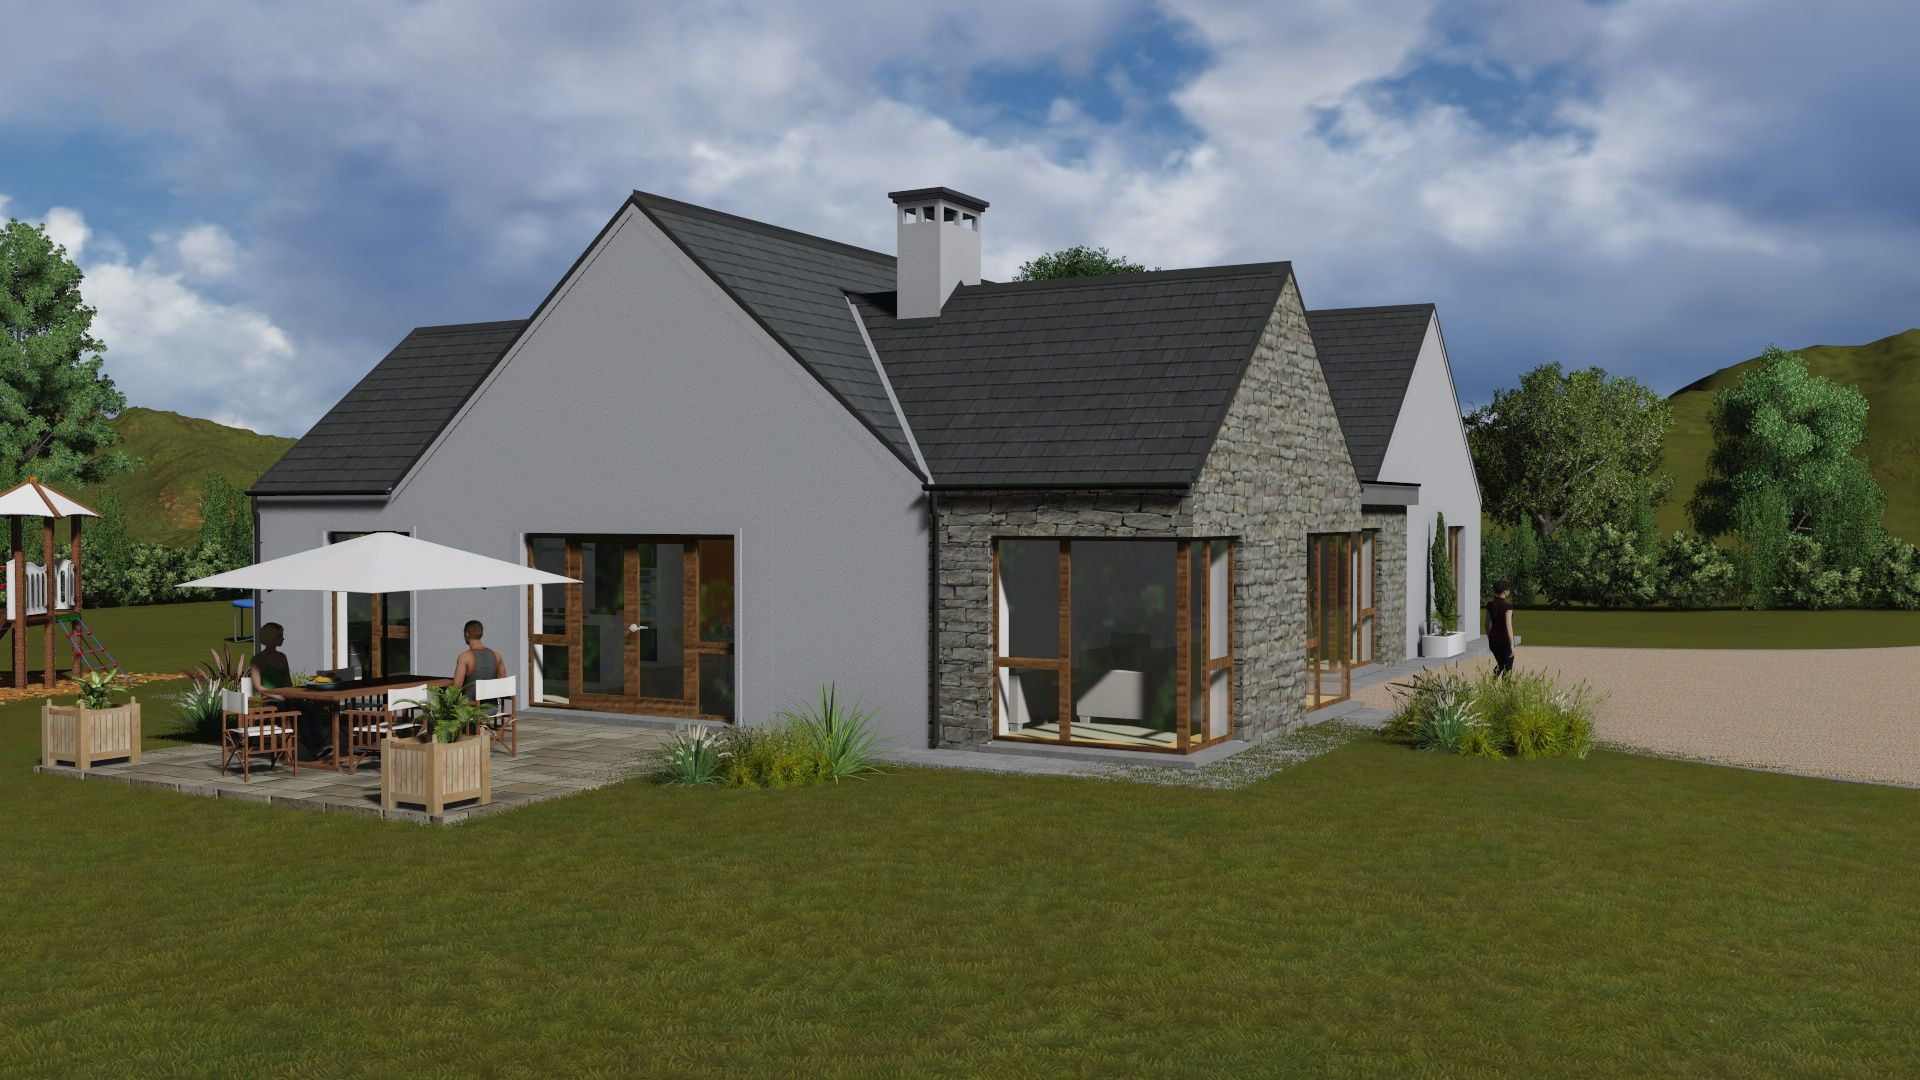 Mod052 House Styles Dream House Plans Building A House